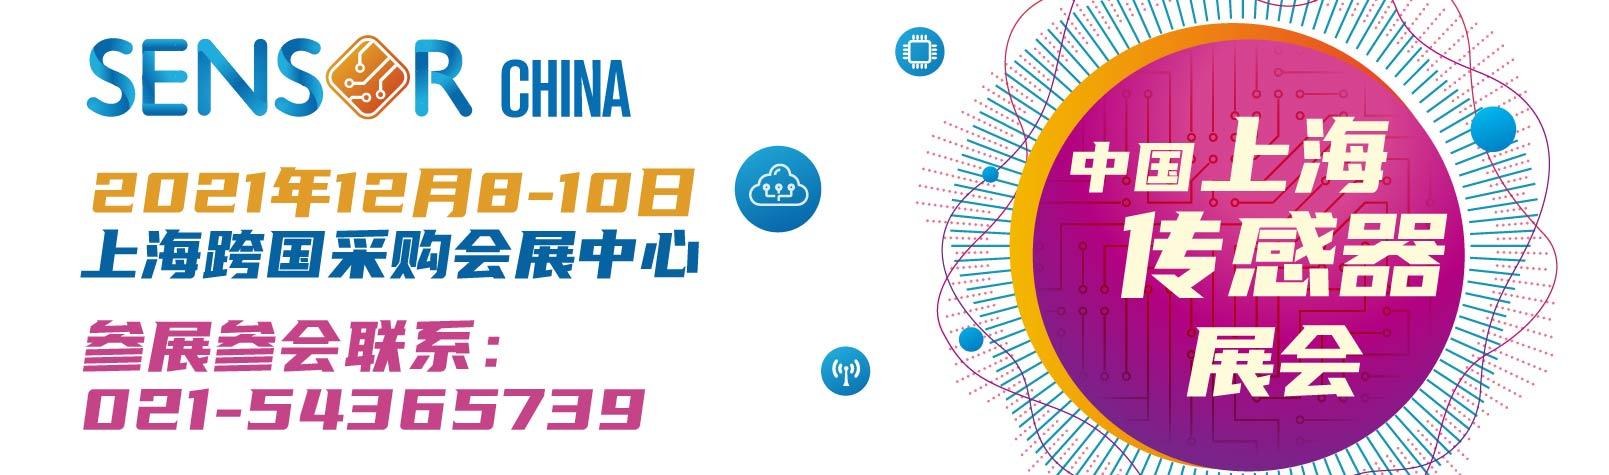 sensor CHINA